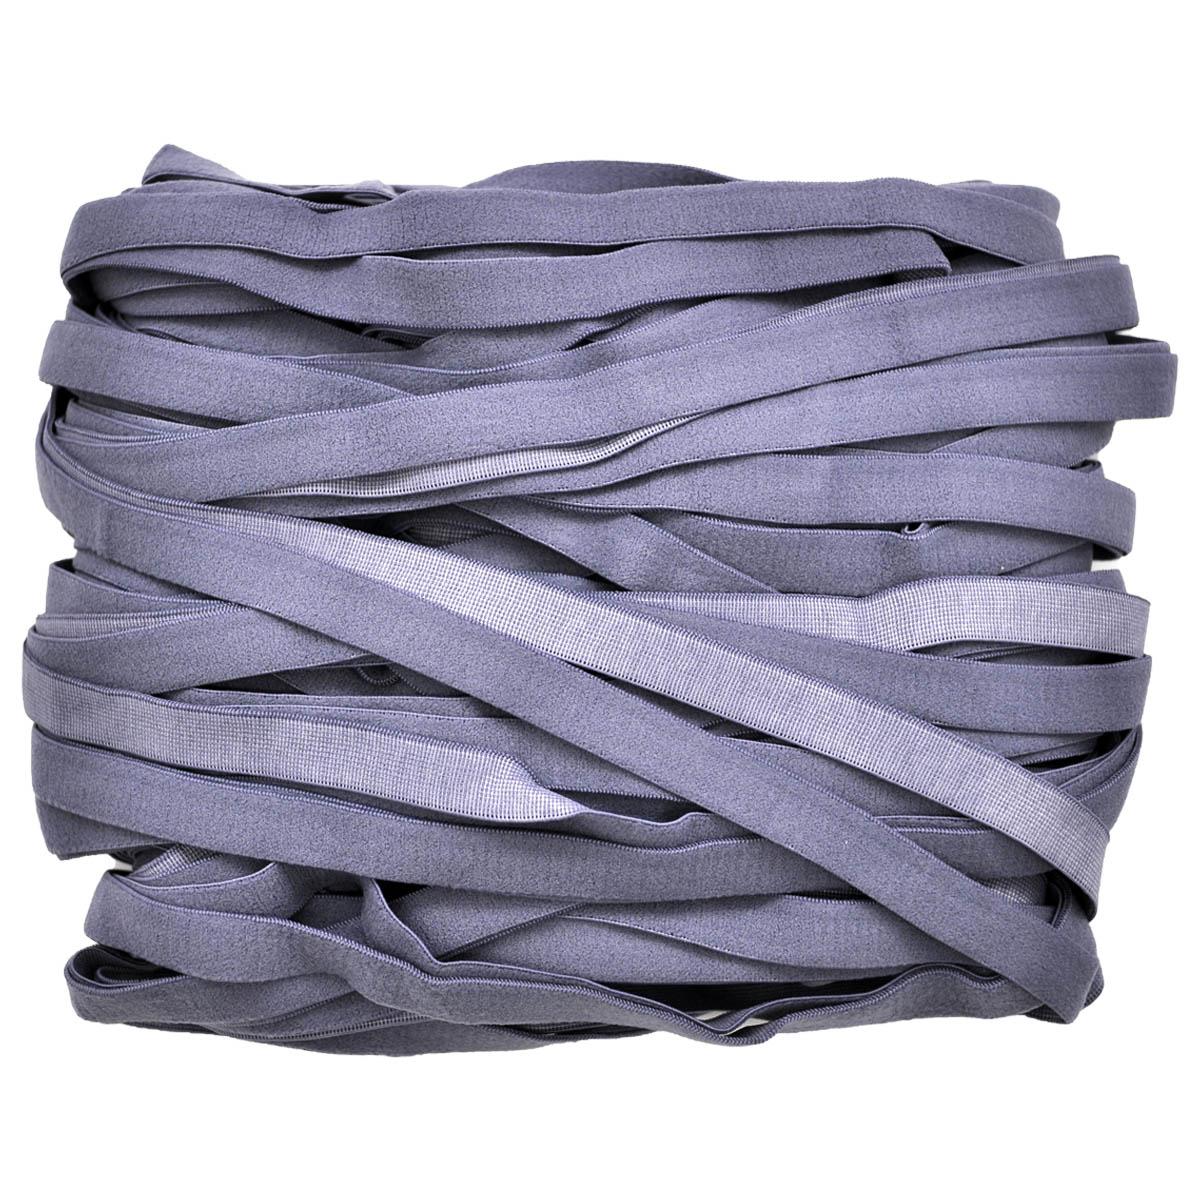 STP/80 эластичная отделочная лента 12мм*50м, лиловый